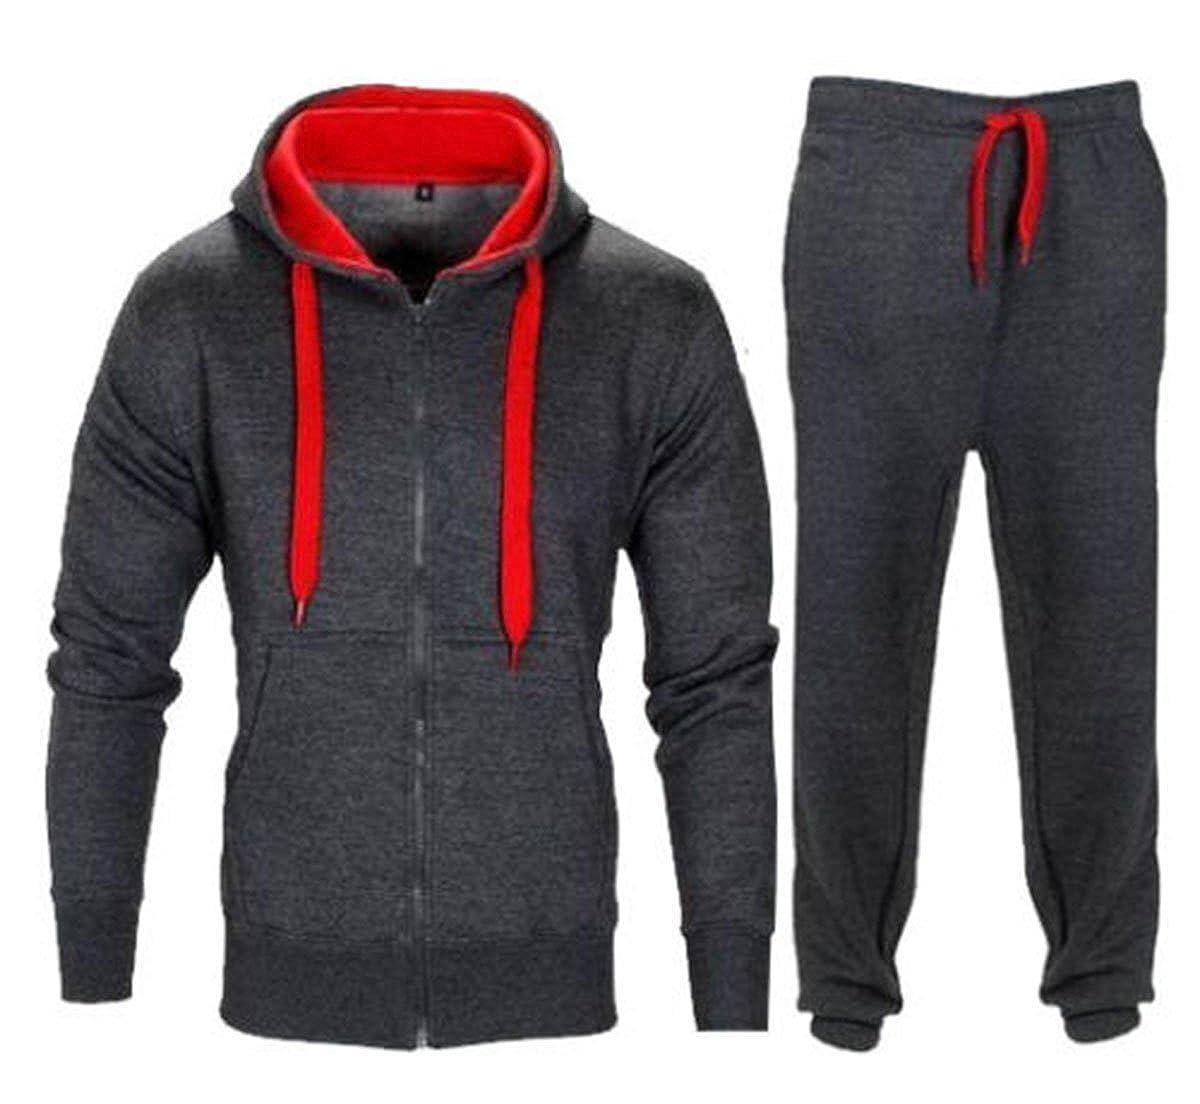 MOIKA Abbigliamento Uomo Men Splicing Cerniera Felpa Top Pantaloni Set Tuta Sportiva Tuta